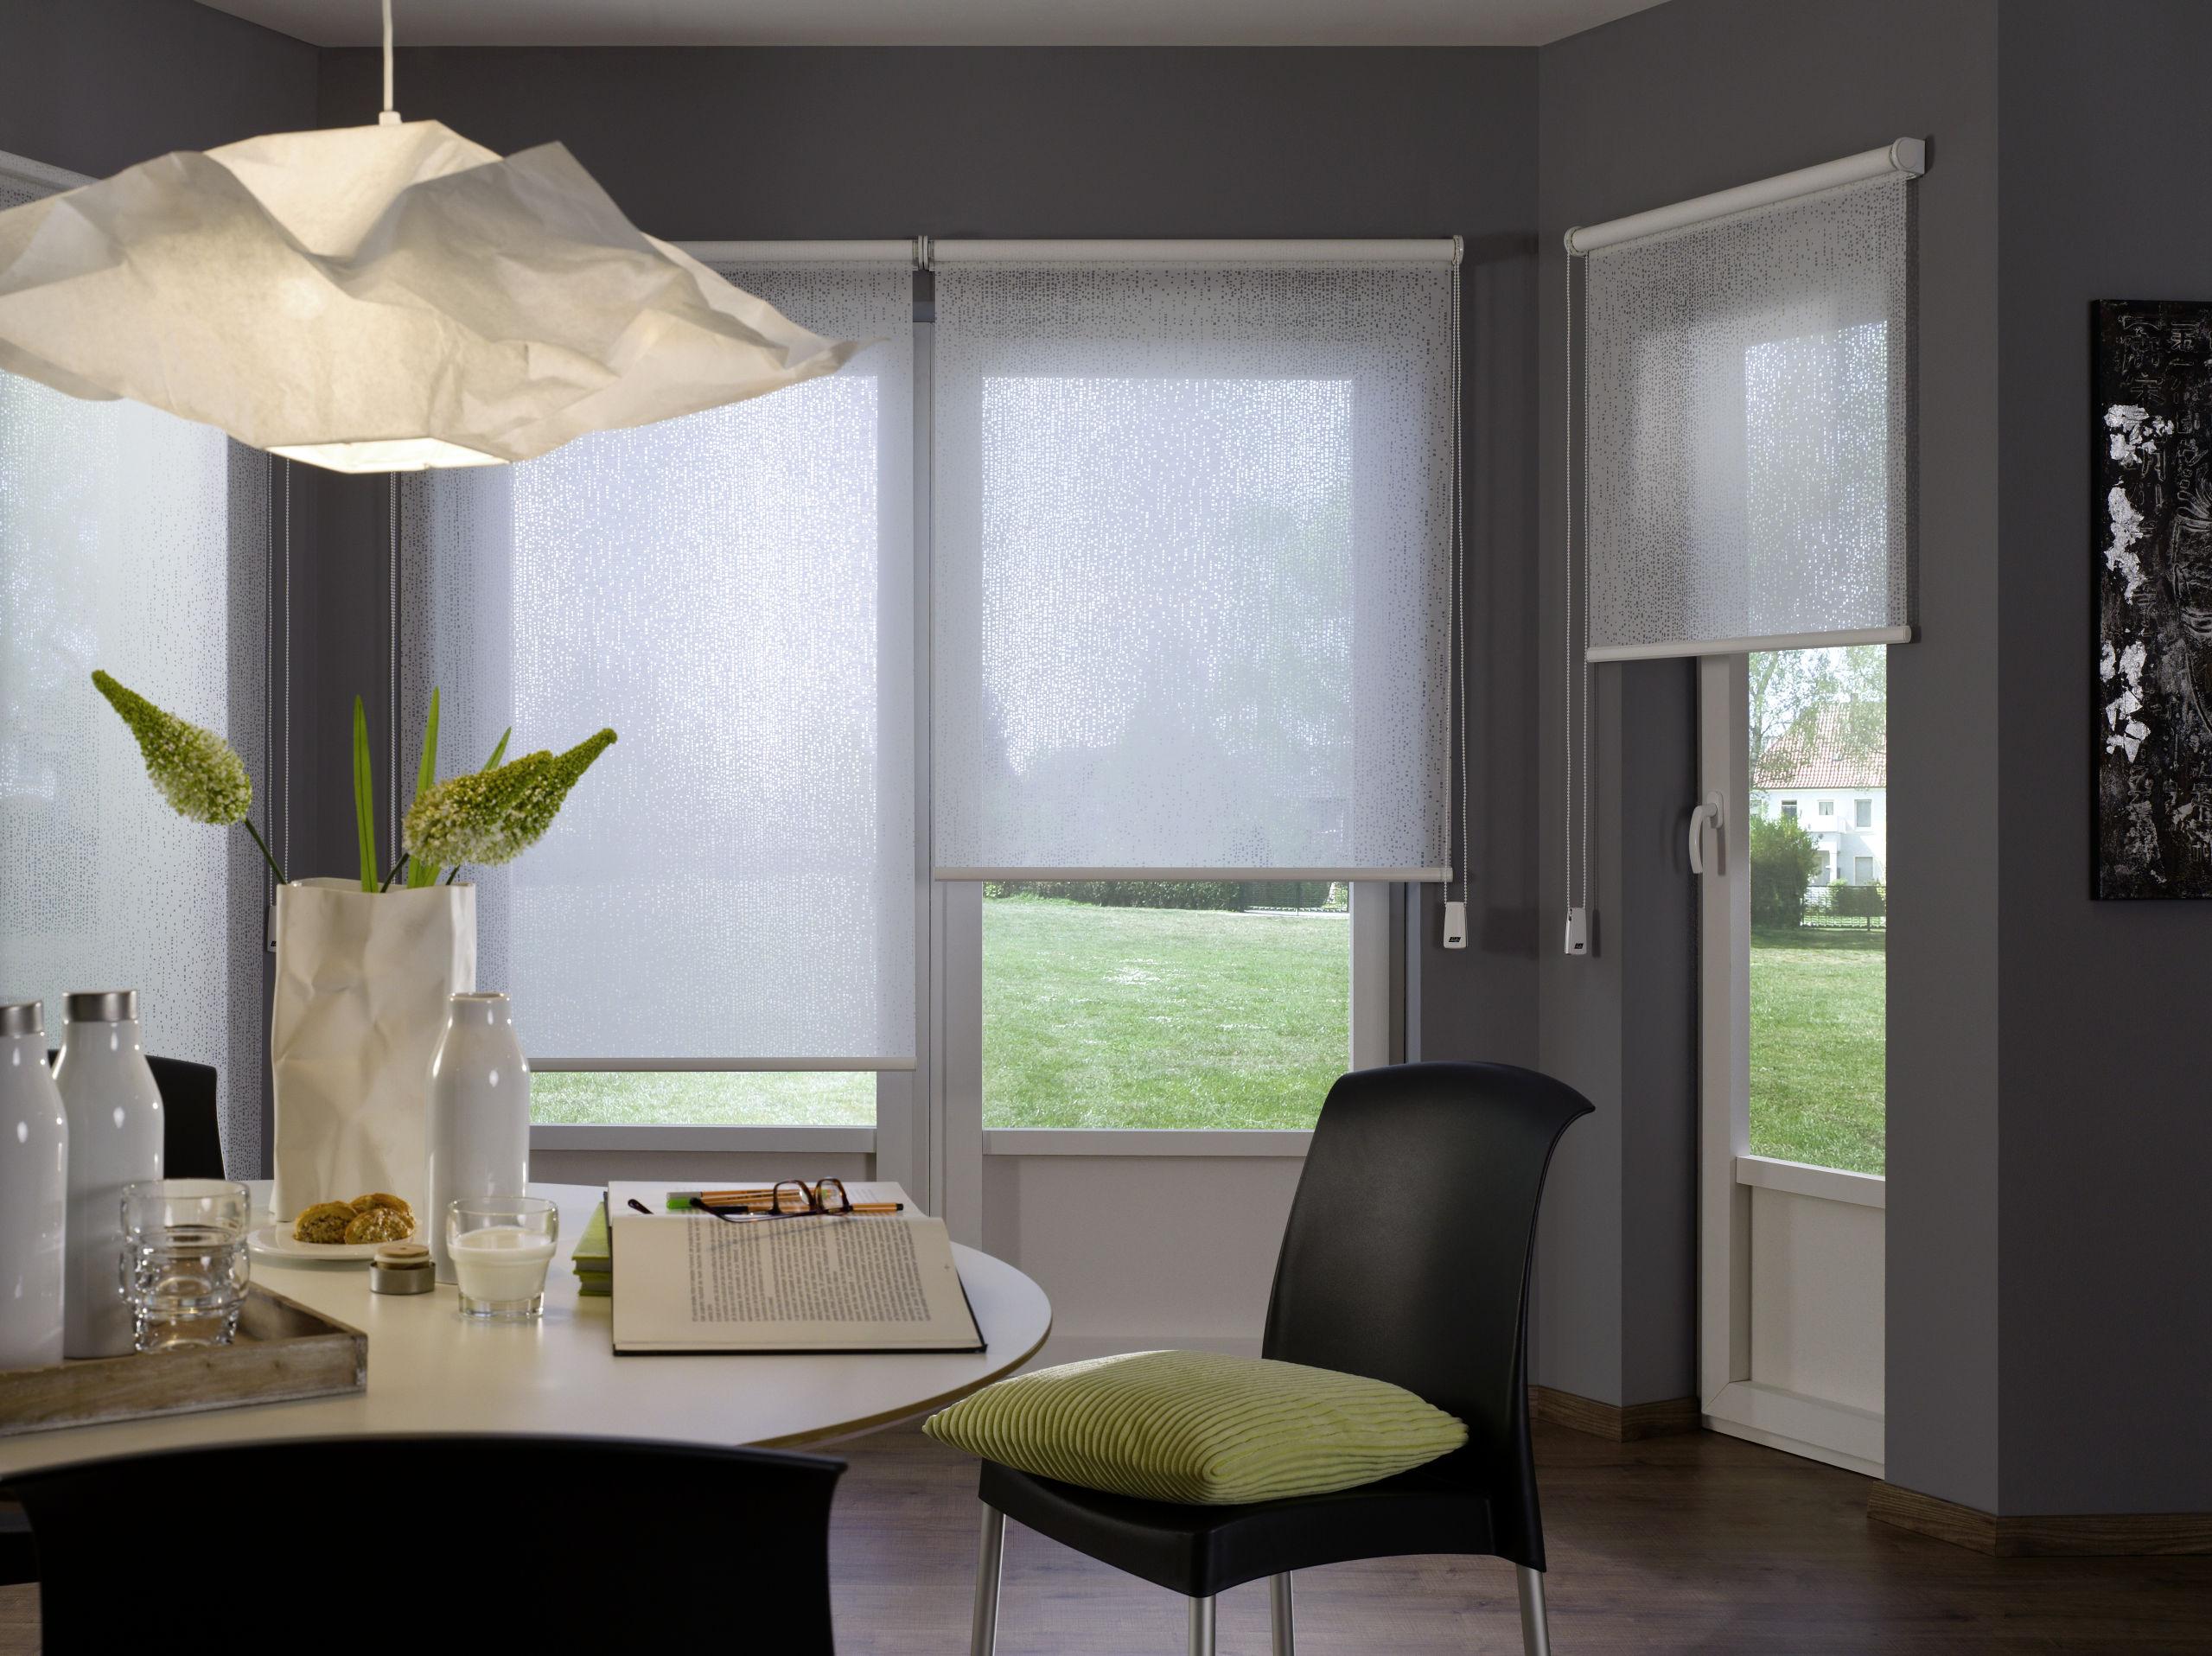 rollos raumausstattung gauweiler speyer. Black Bedroom Furniture Sets. Home Design Ideas